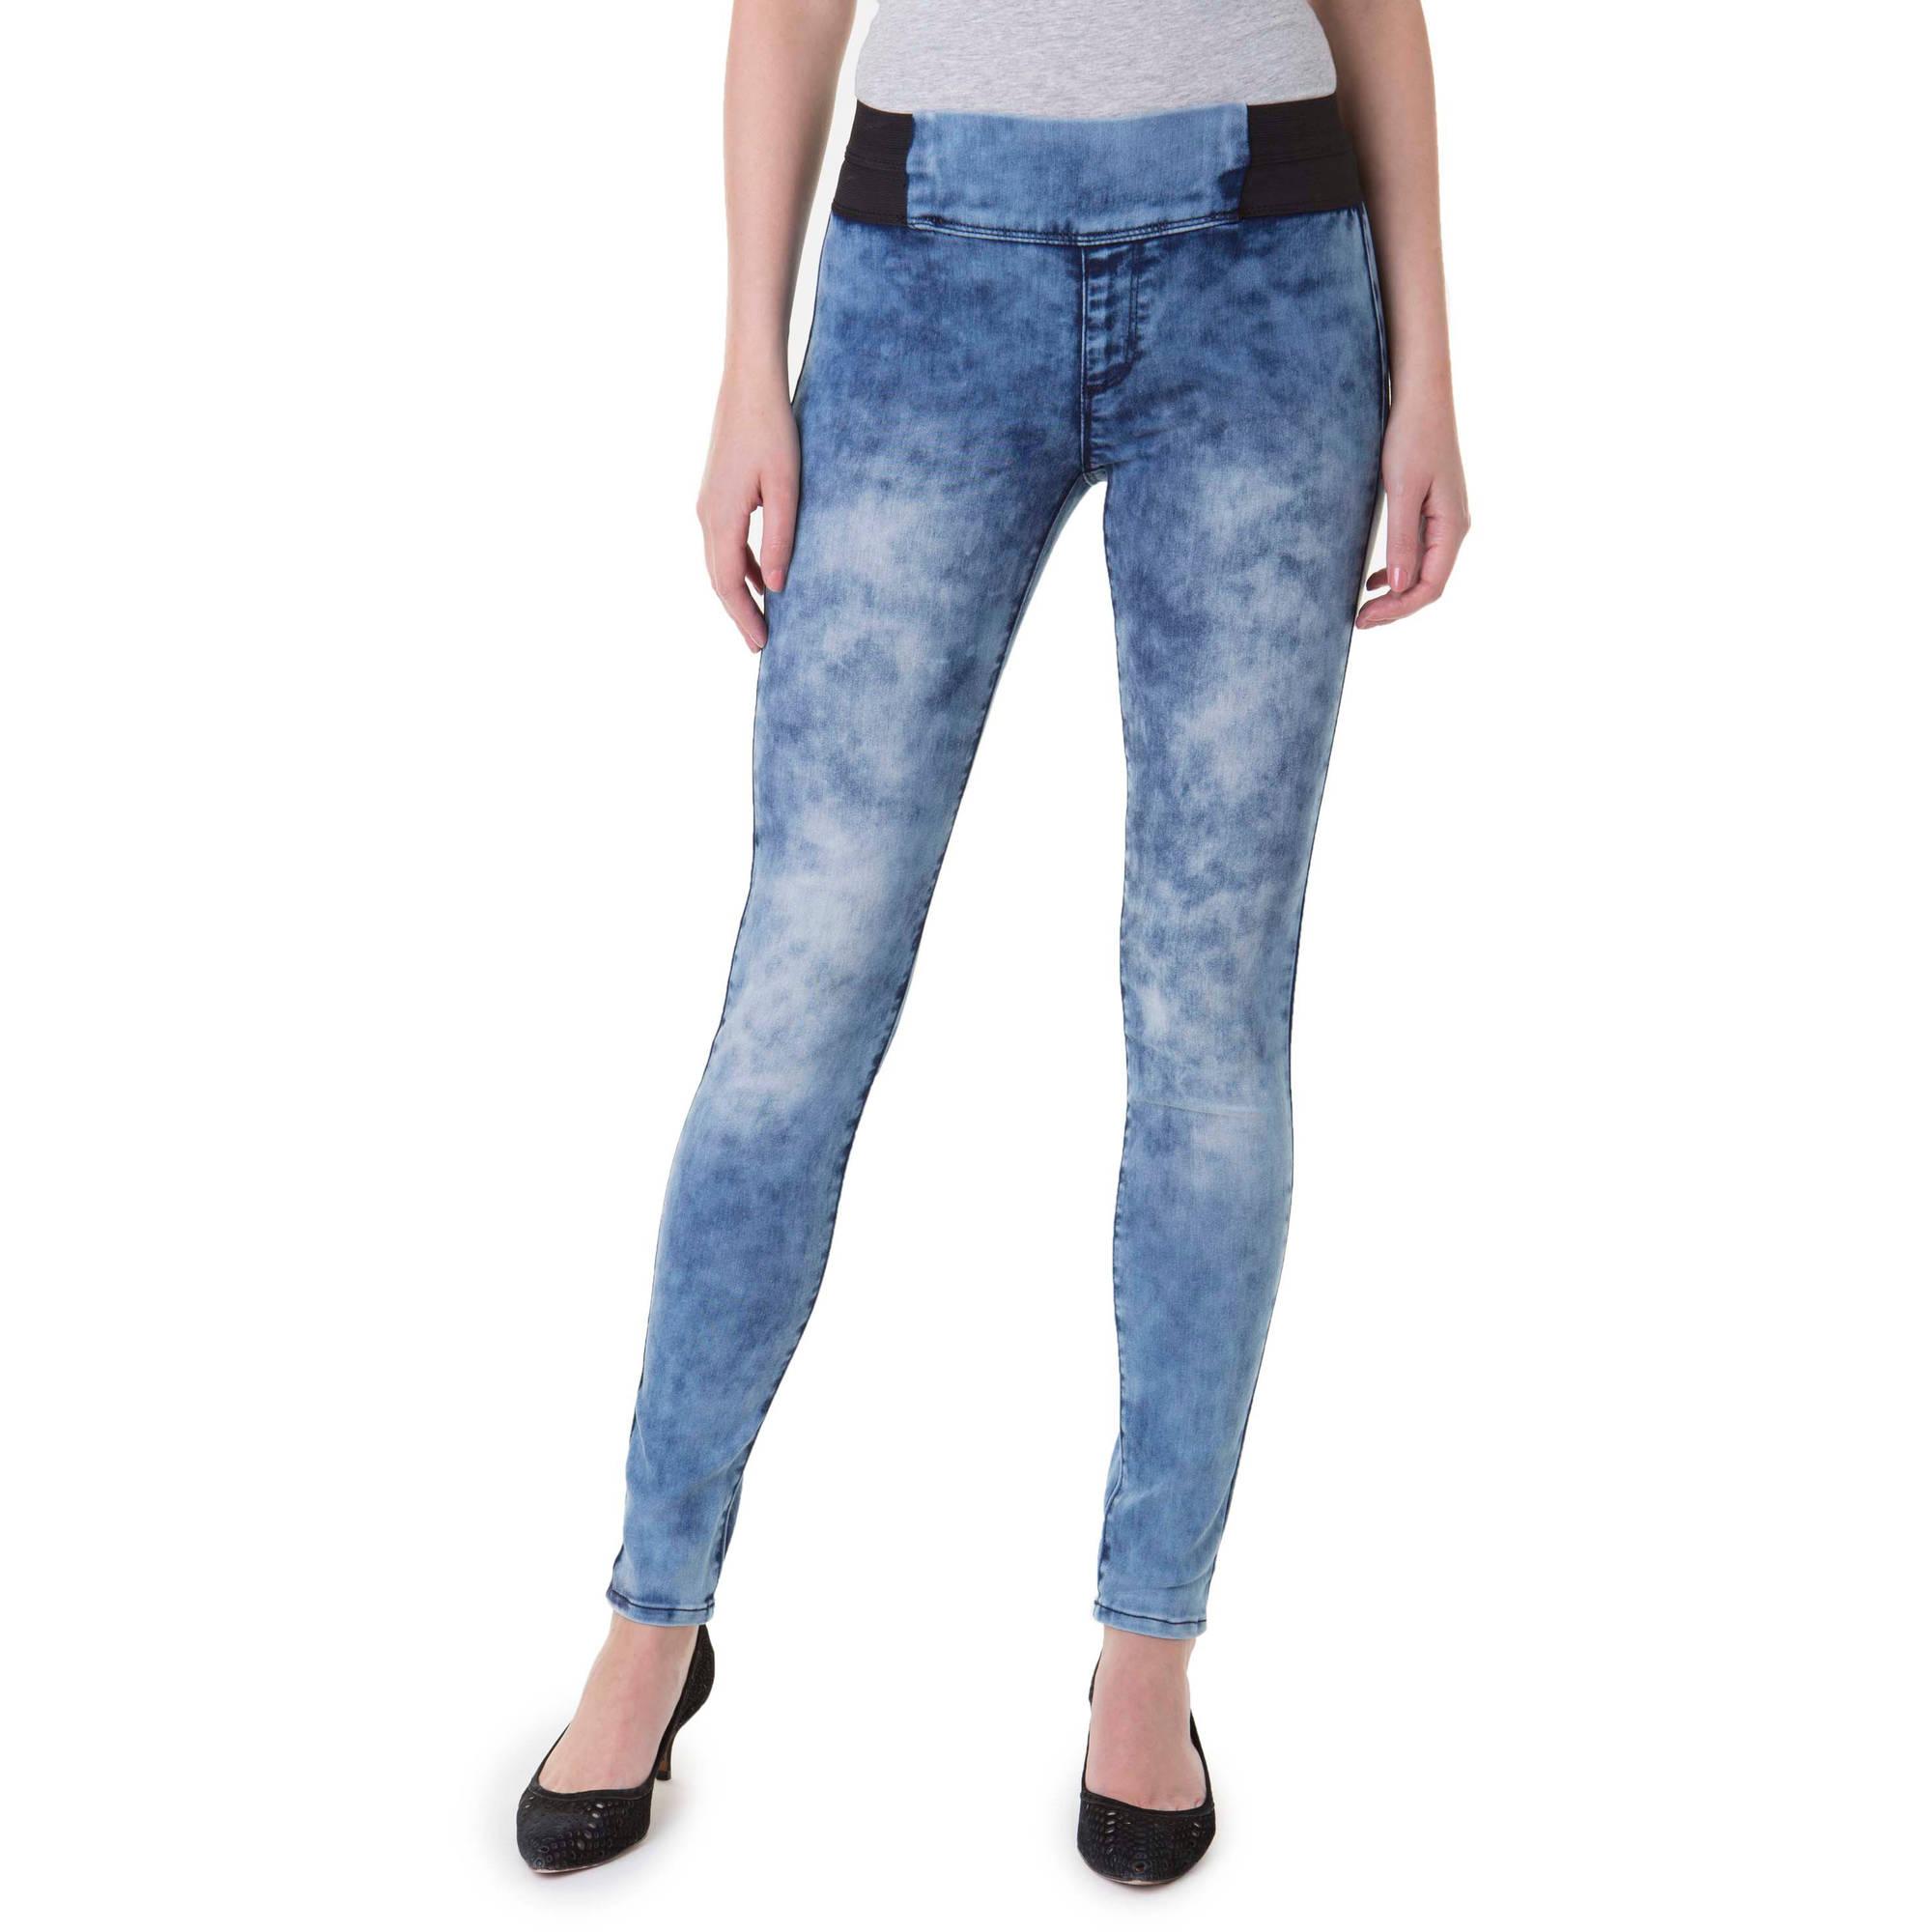 J Jeans by Jordache Juniors' Jeggings